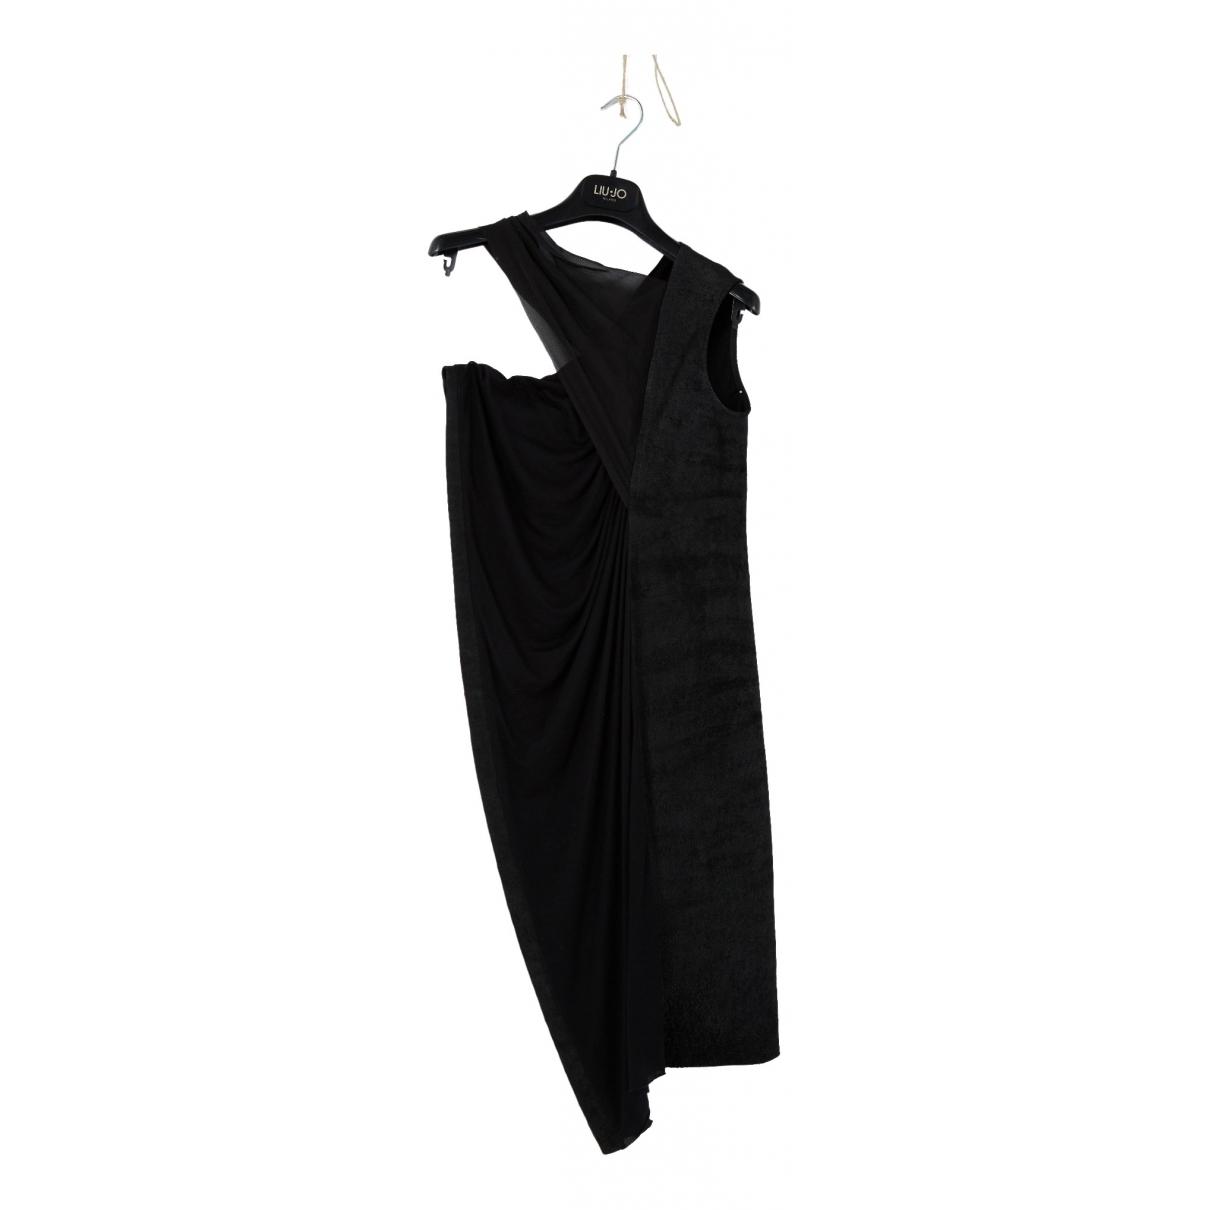 Rick Owens \N Black Cotton dress for Women 42 IT